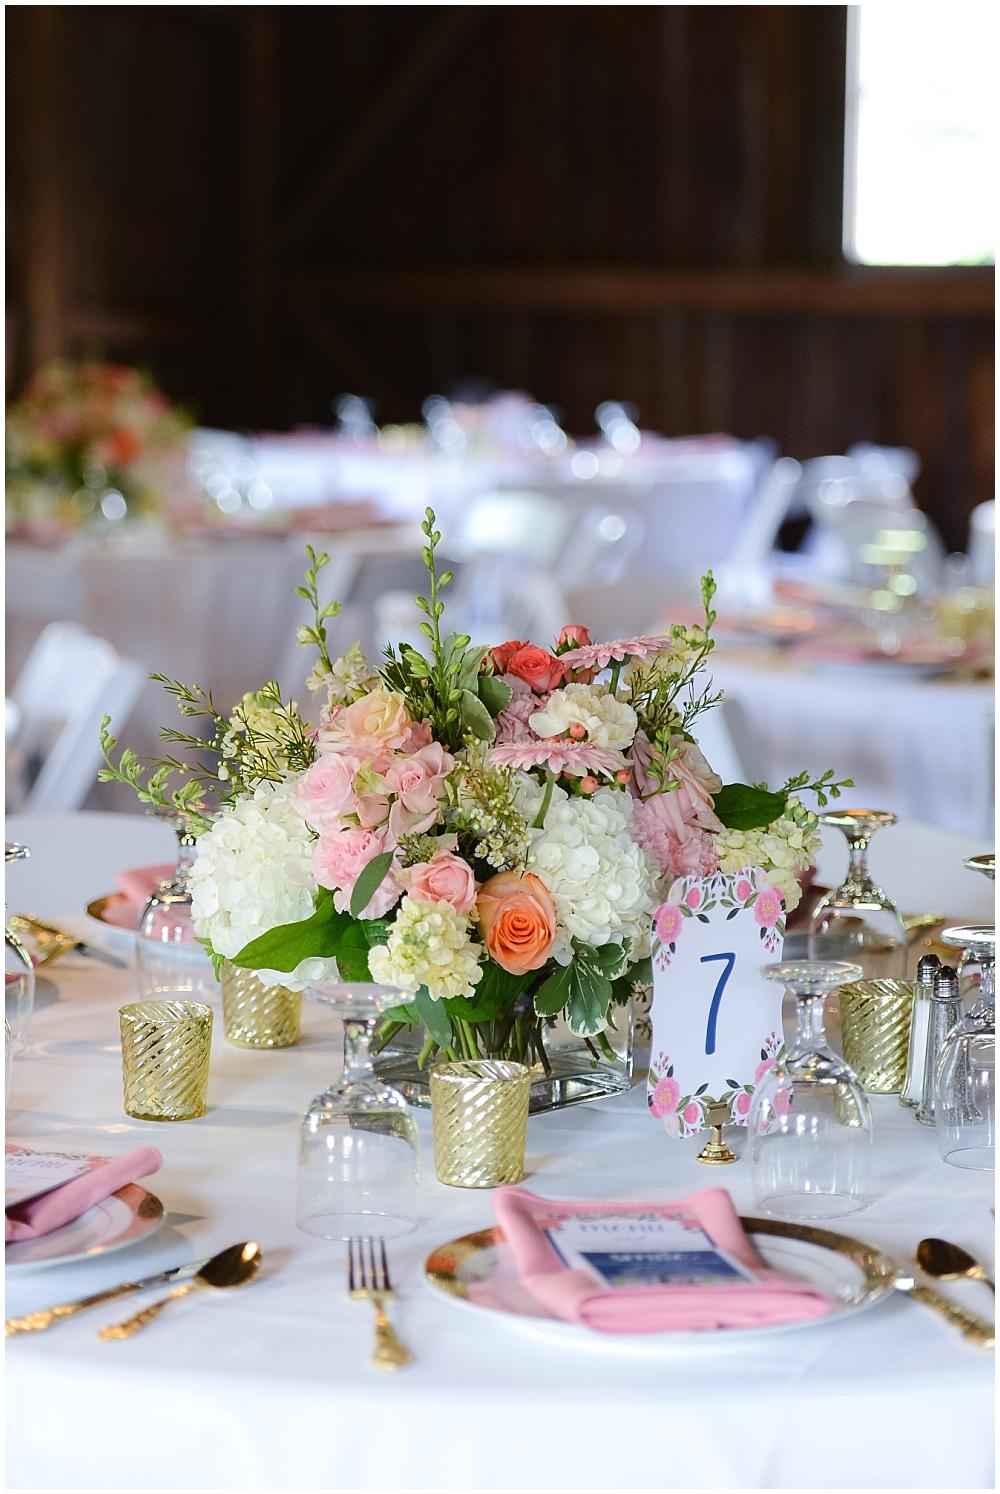 Blush and white wedding floral centerpieces | Mustard Seed Gardens Wedding by Sara Ackermann Photography & Jessica Dum Wedding Coordination